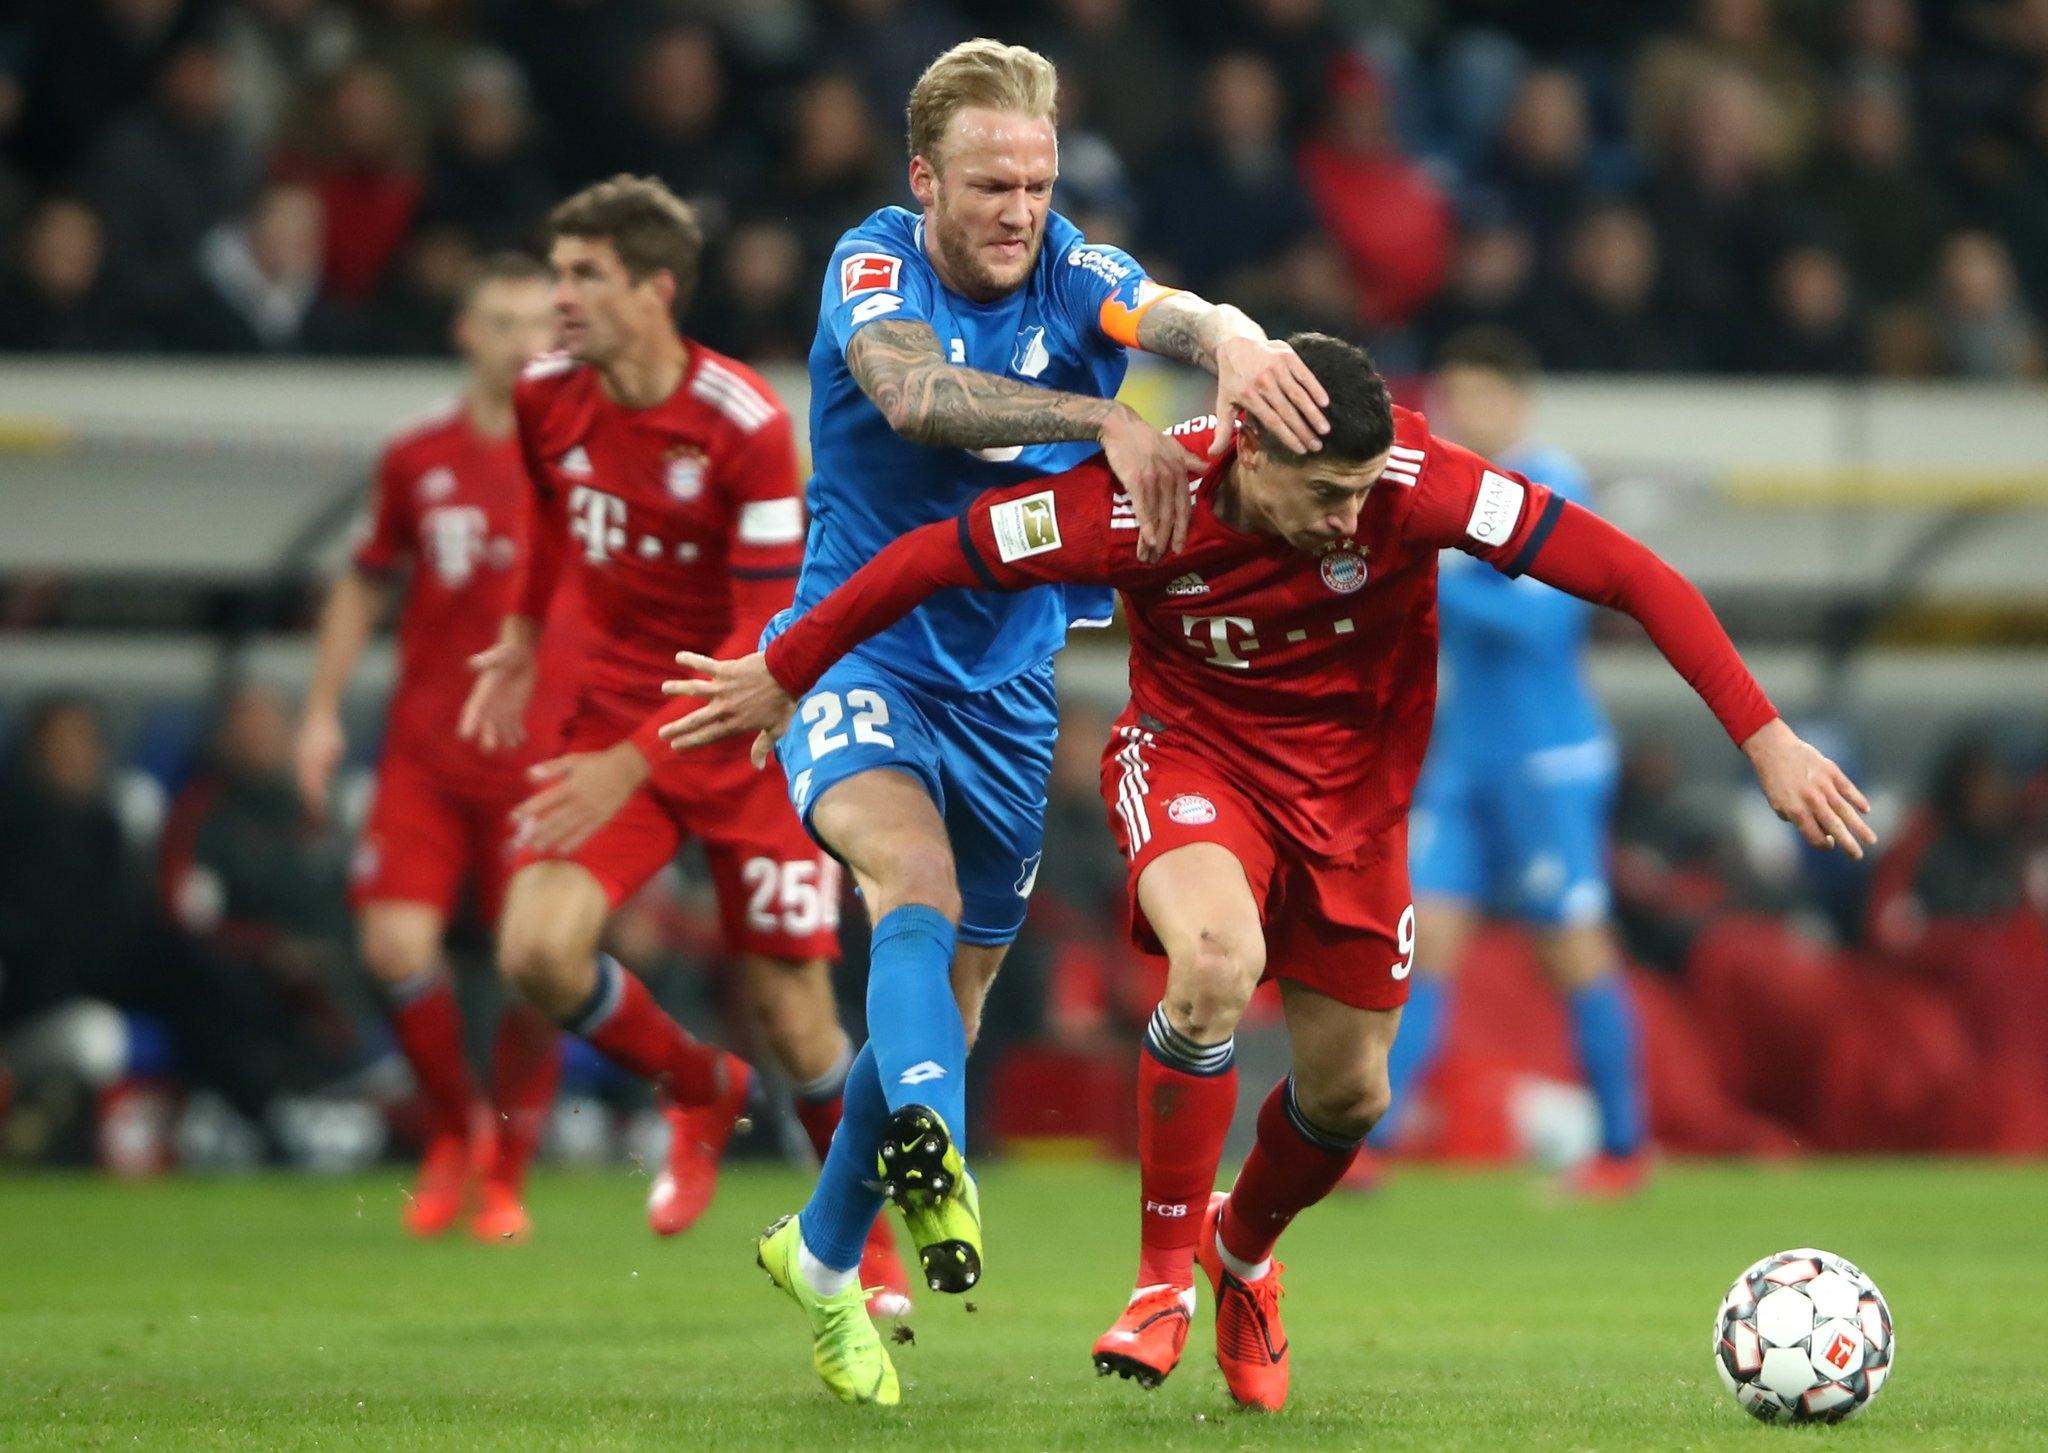 Хофенхайм и Байерн Мюнхен откриват 18-ия кръг в Бундеслигата и